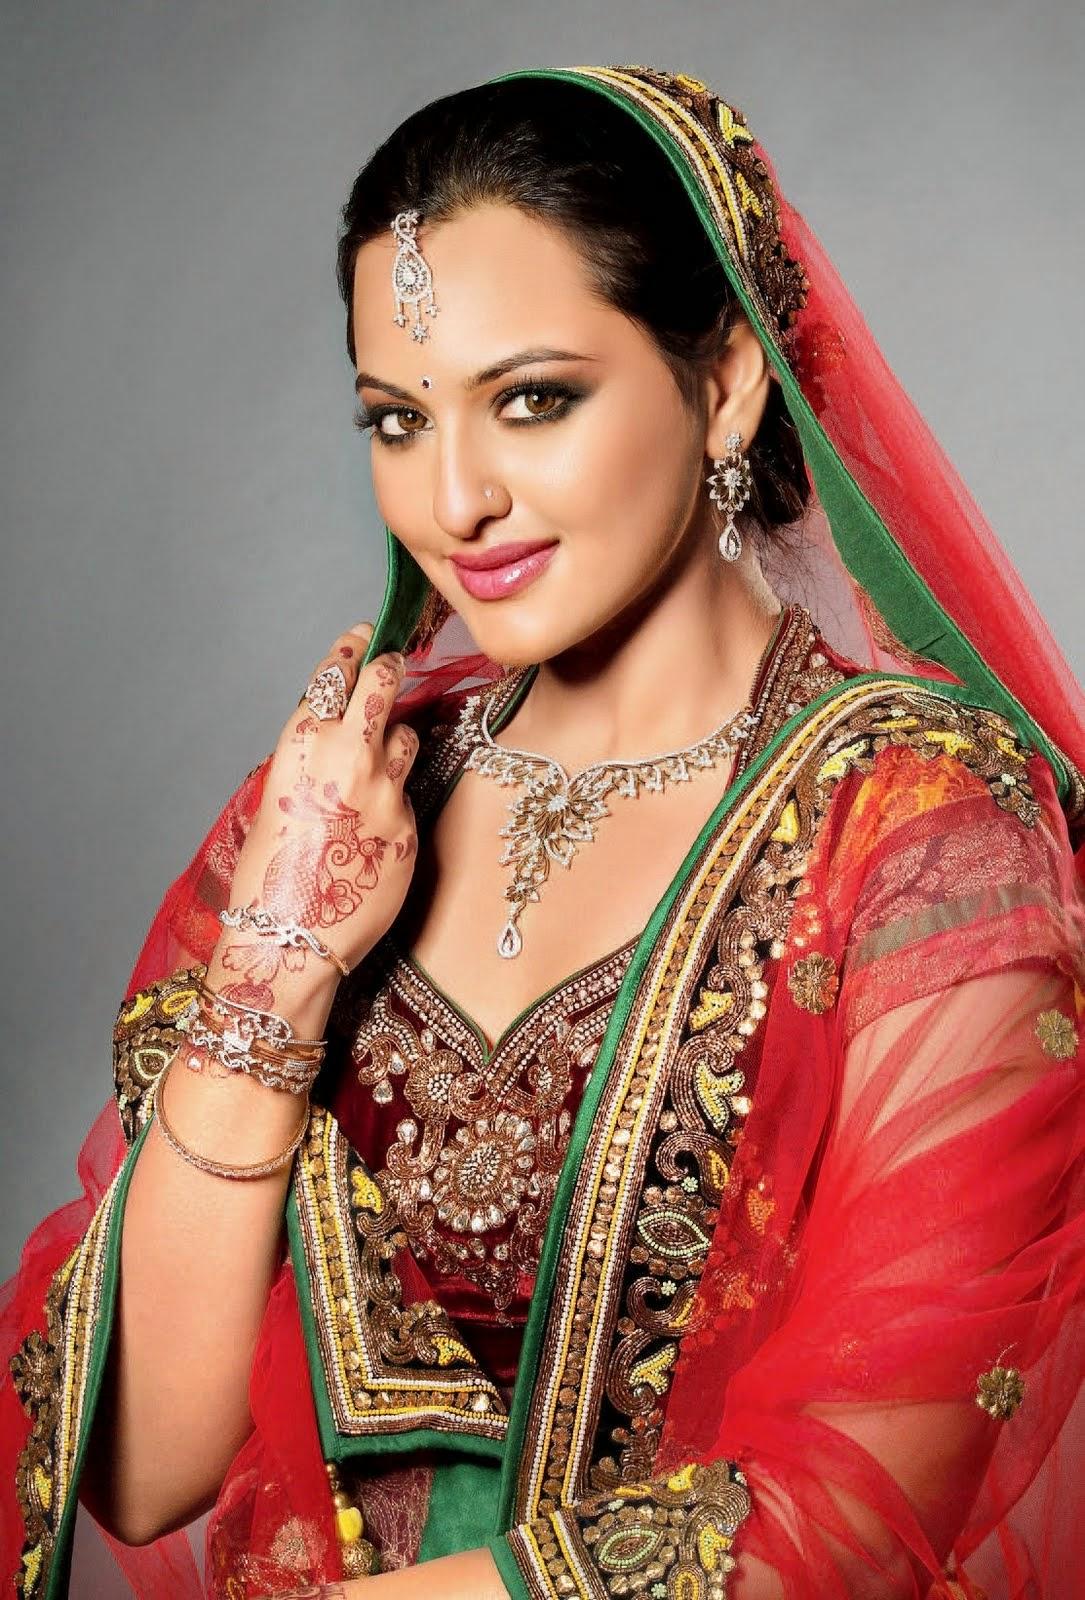 Hot | Nice | Cute: Sonakshi Sinha Photo Gellery